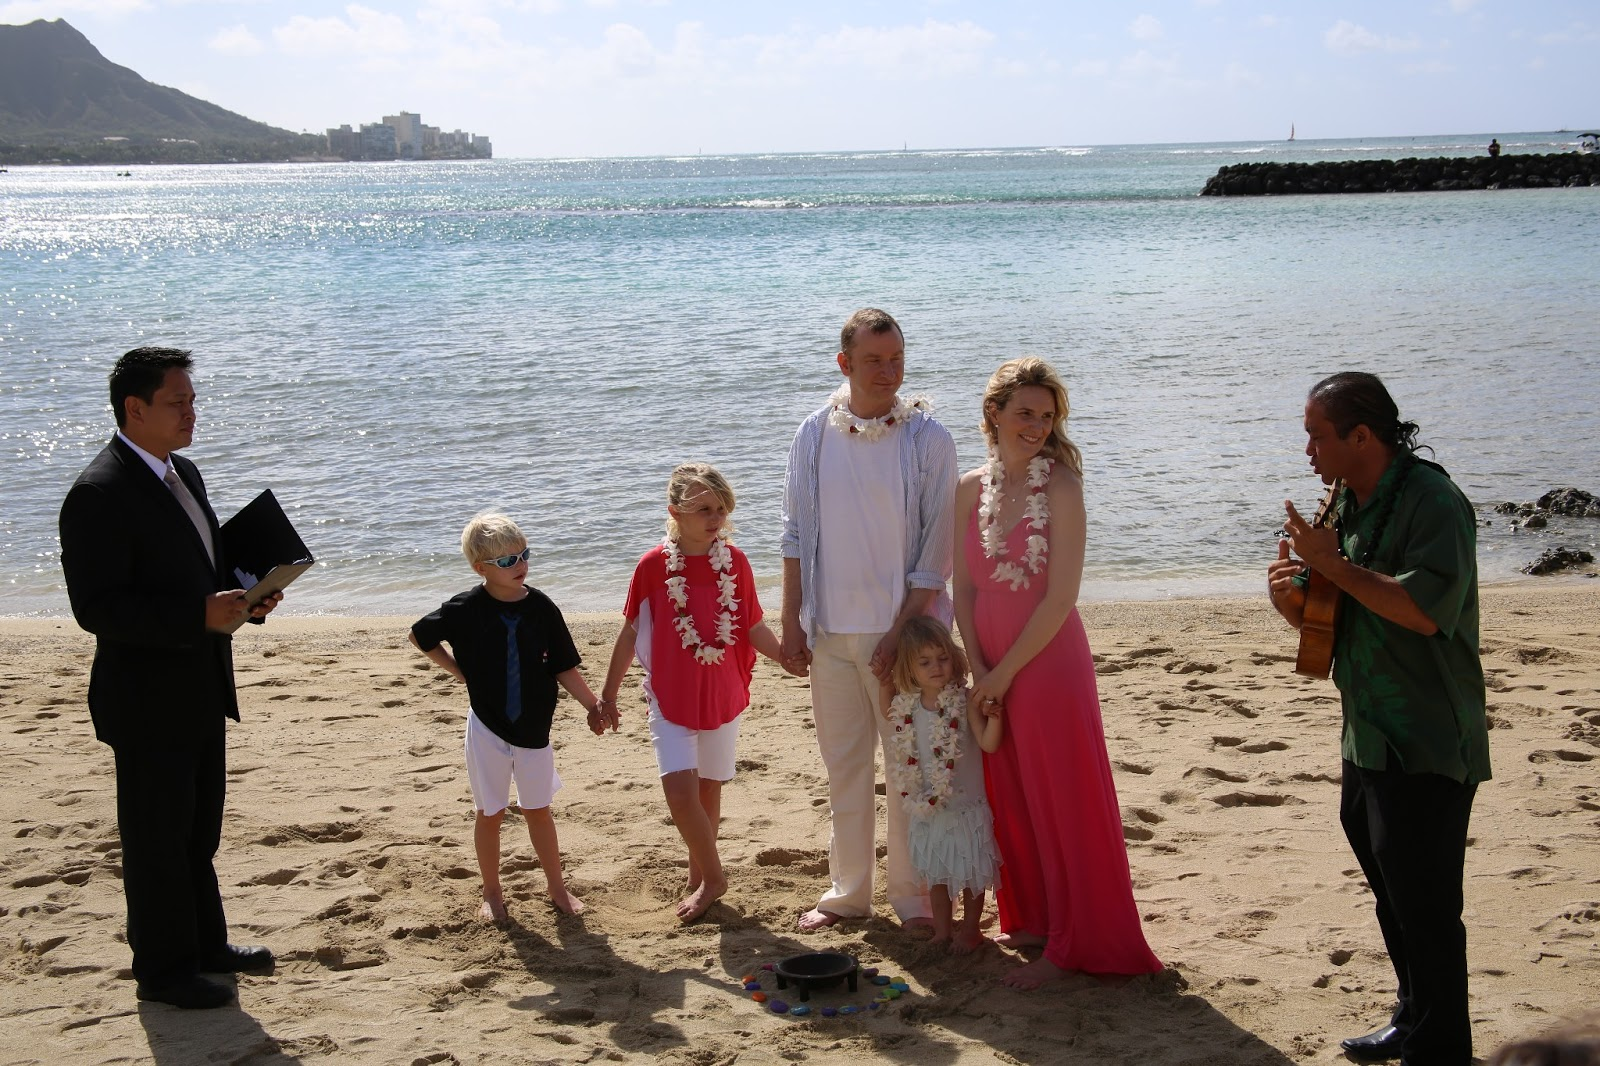 Beach Vow Renewal Ceremony: Cristina Spencer: Vow Renewal :: The Ceremony